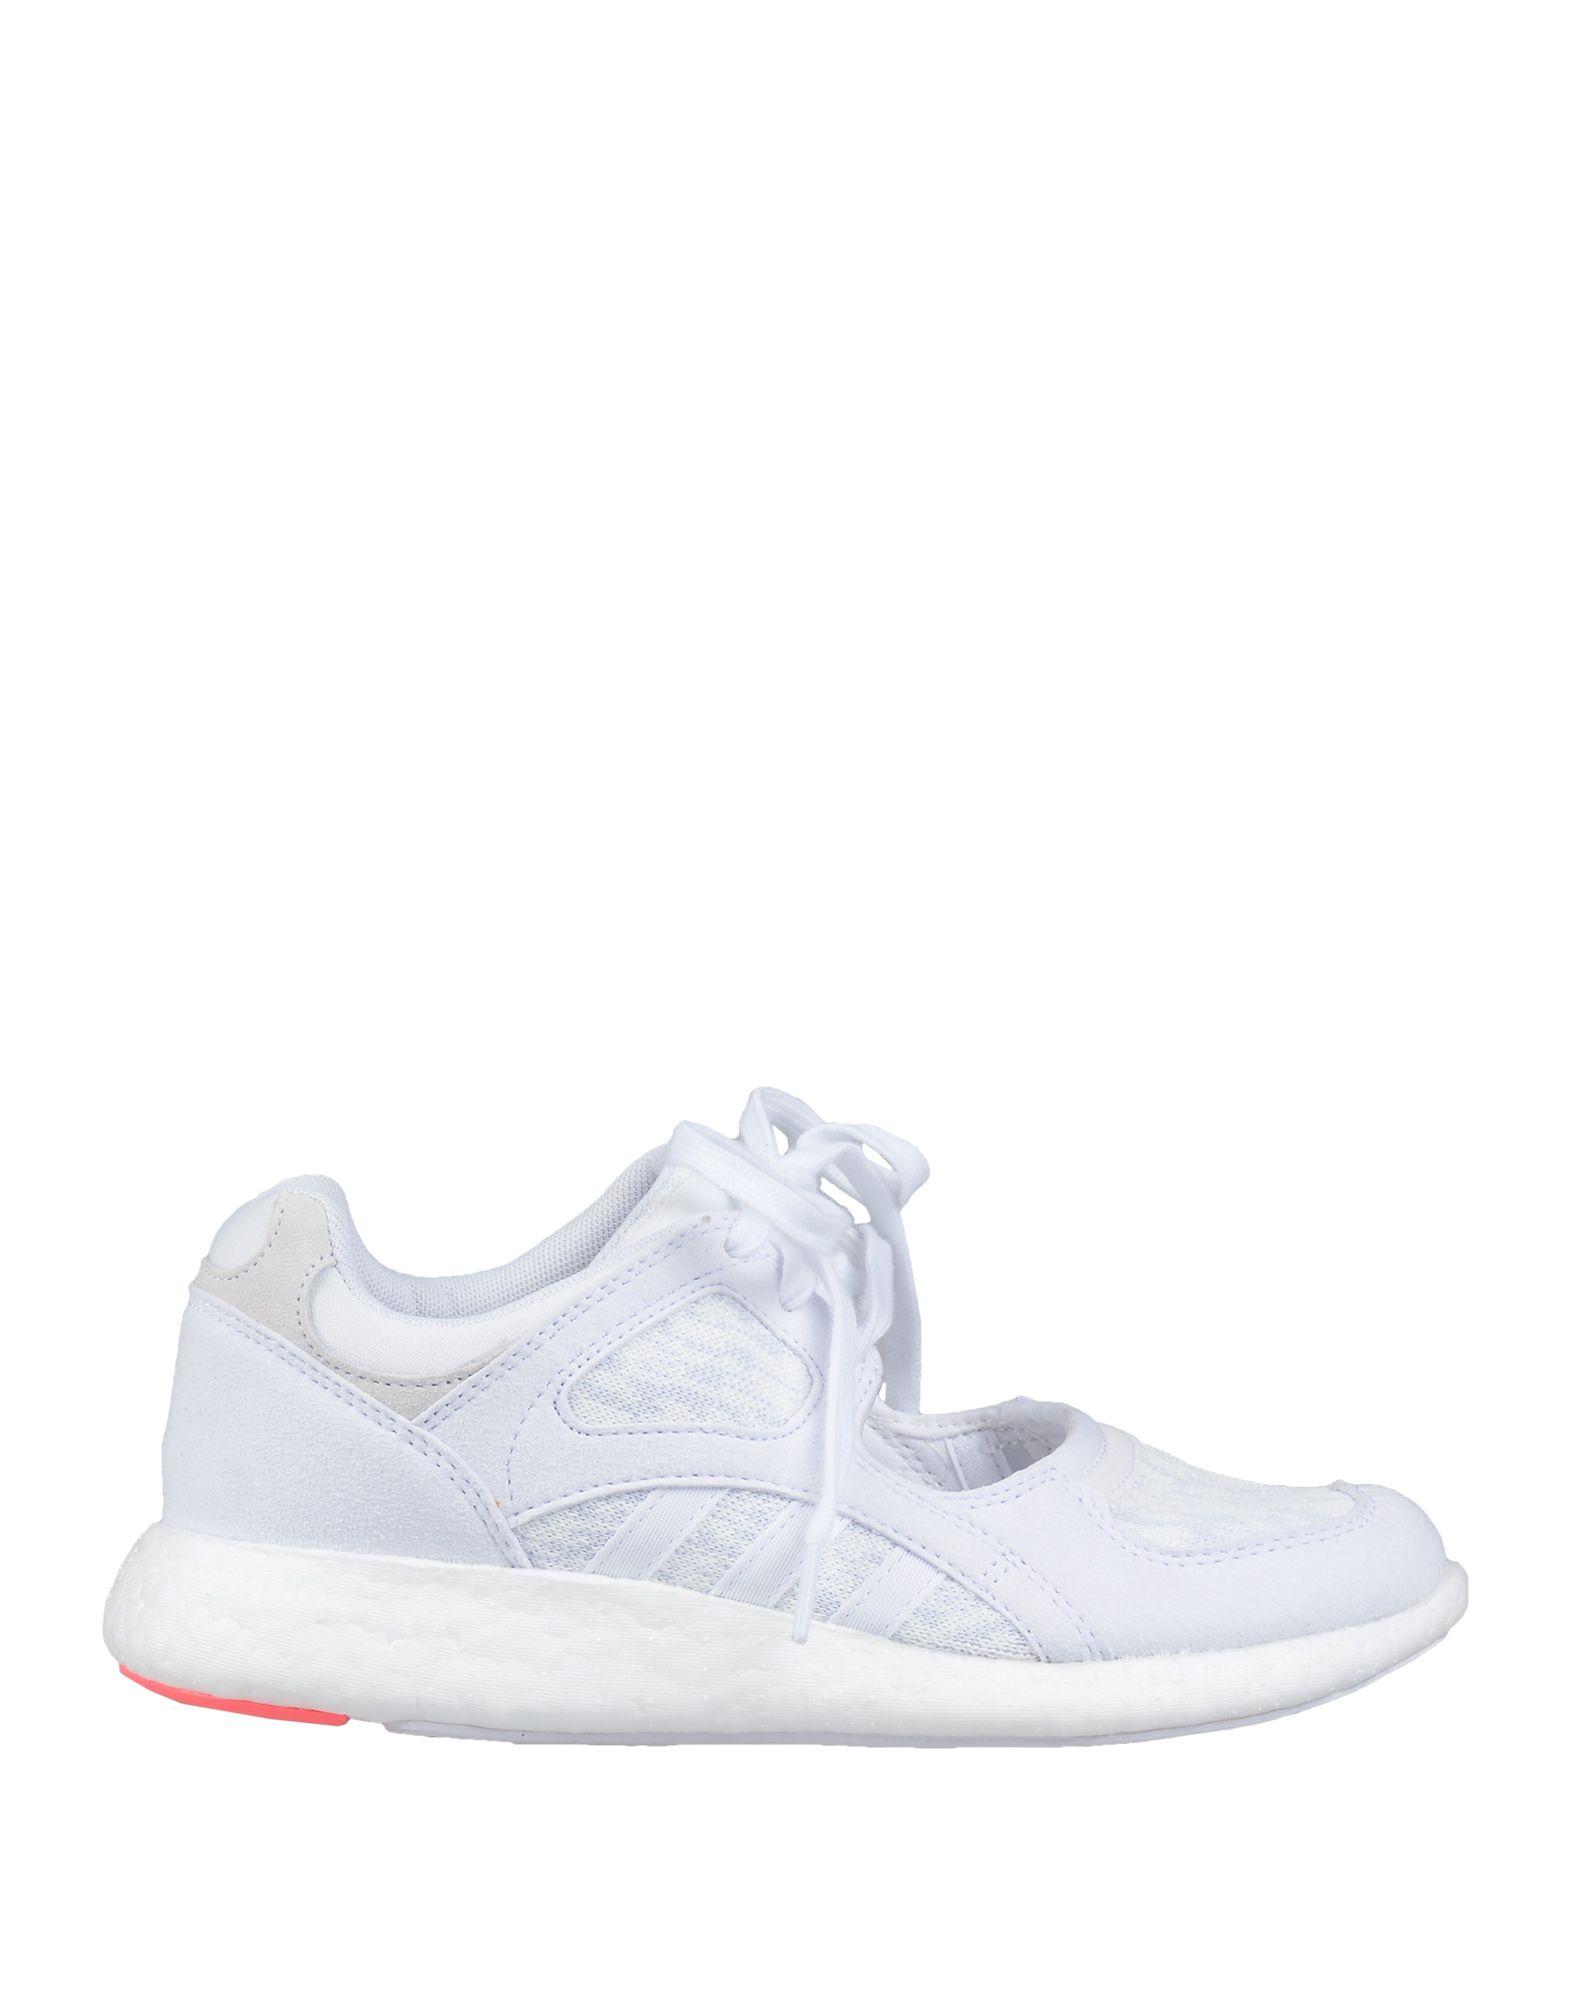 Turnschuhe Adidas Originals damen - 11528738PO